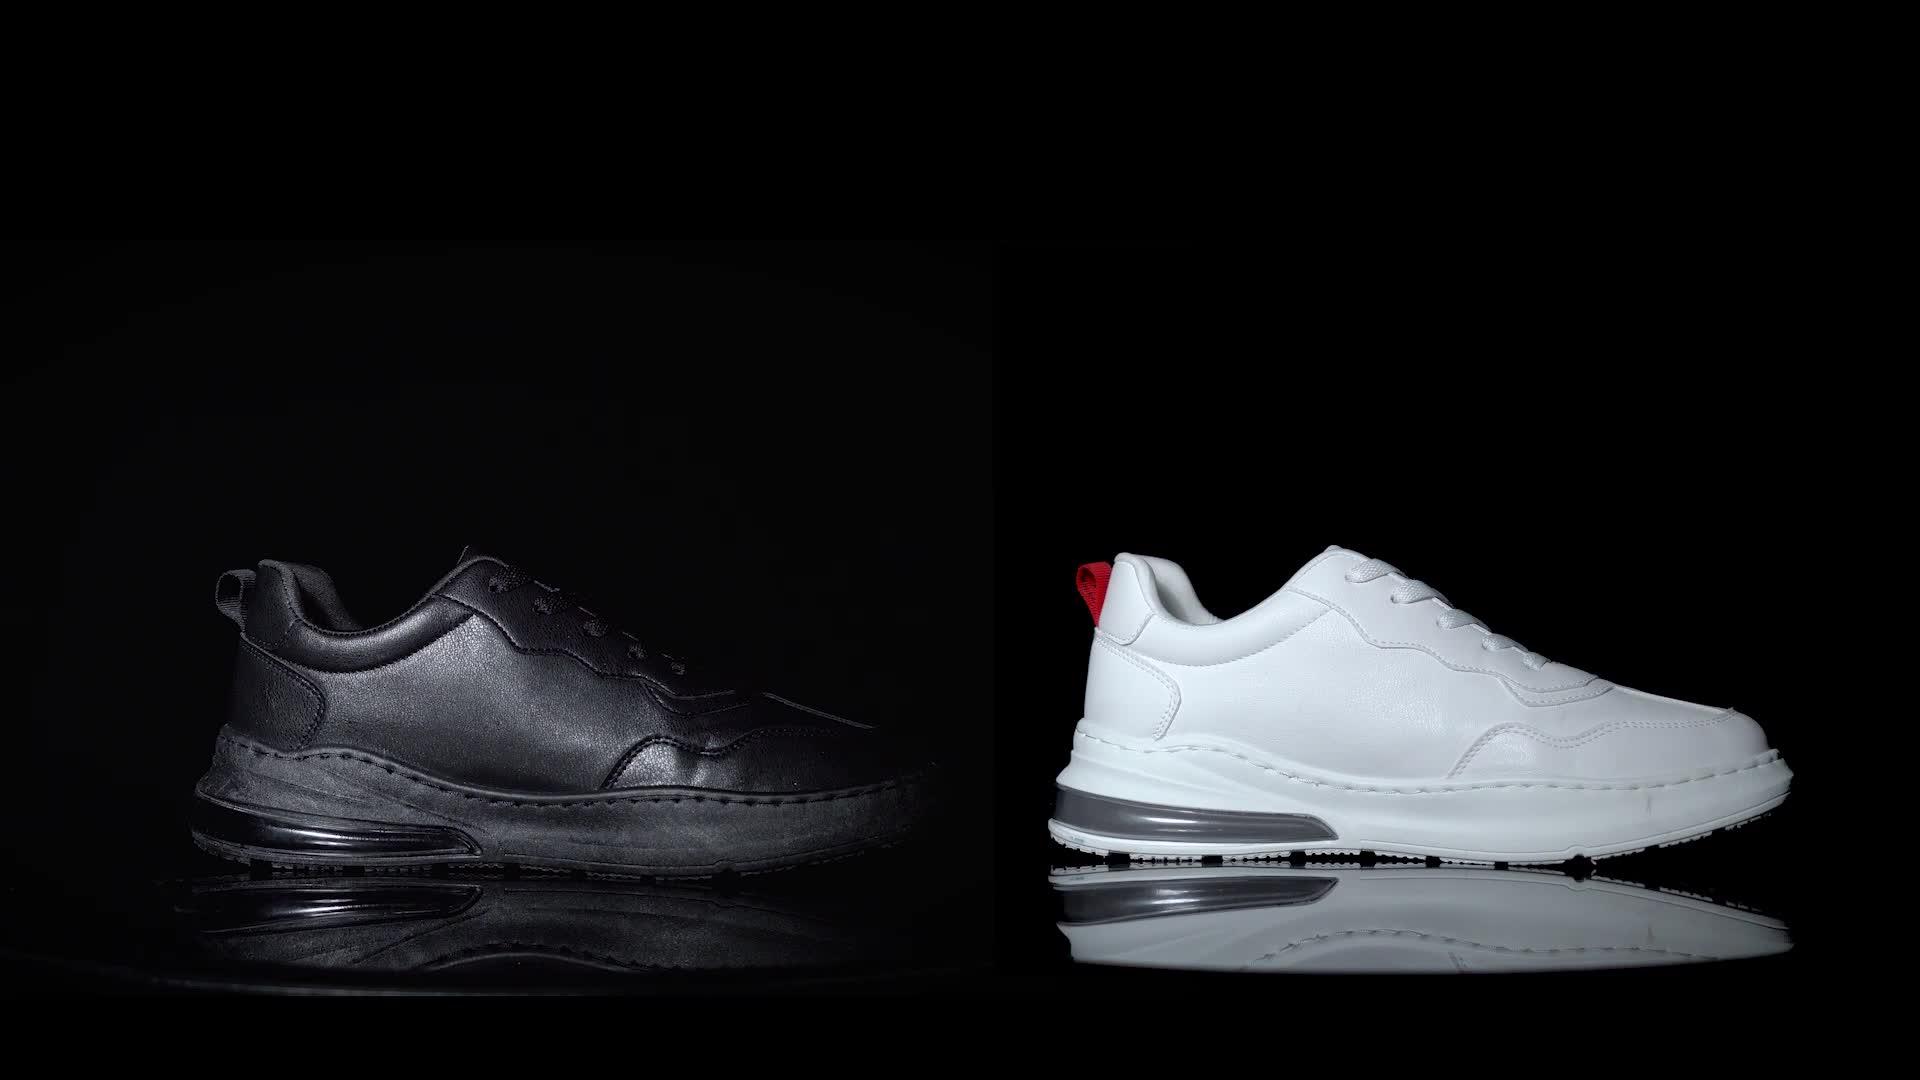 Kustom Grosir Baru Fashion Pria Sepatu Kasual + Sepatu Pria Kasual Sepatu Dibuat Di Cina